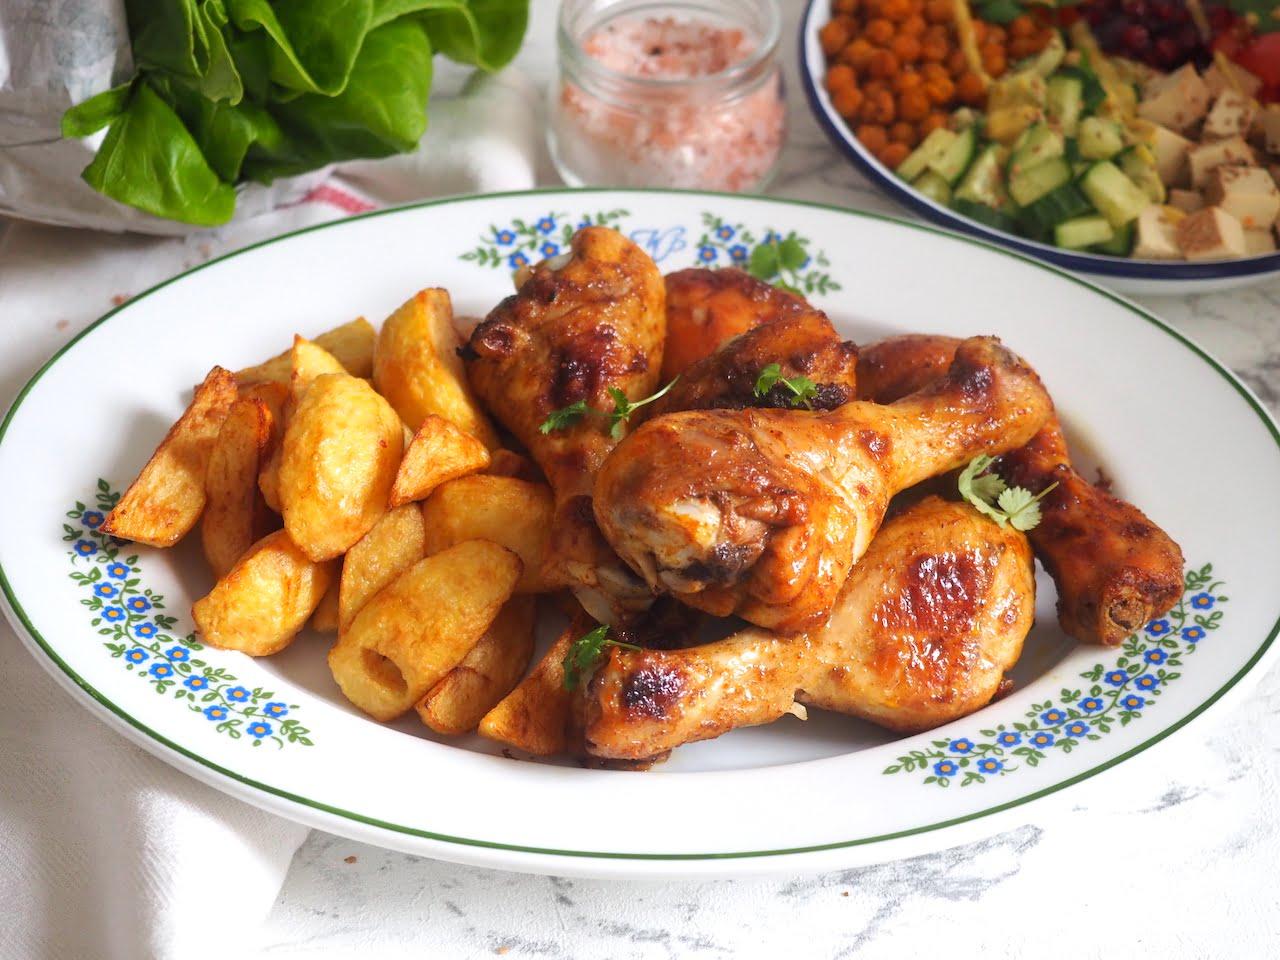 Pikantny pieczony kurczak z musztardą